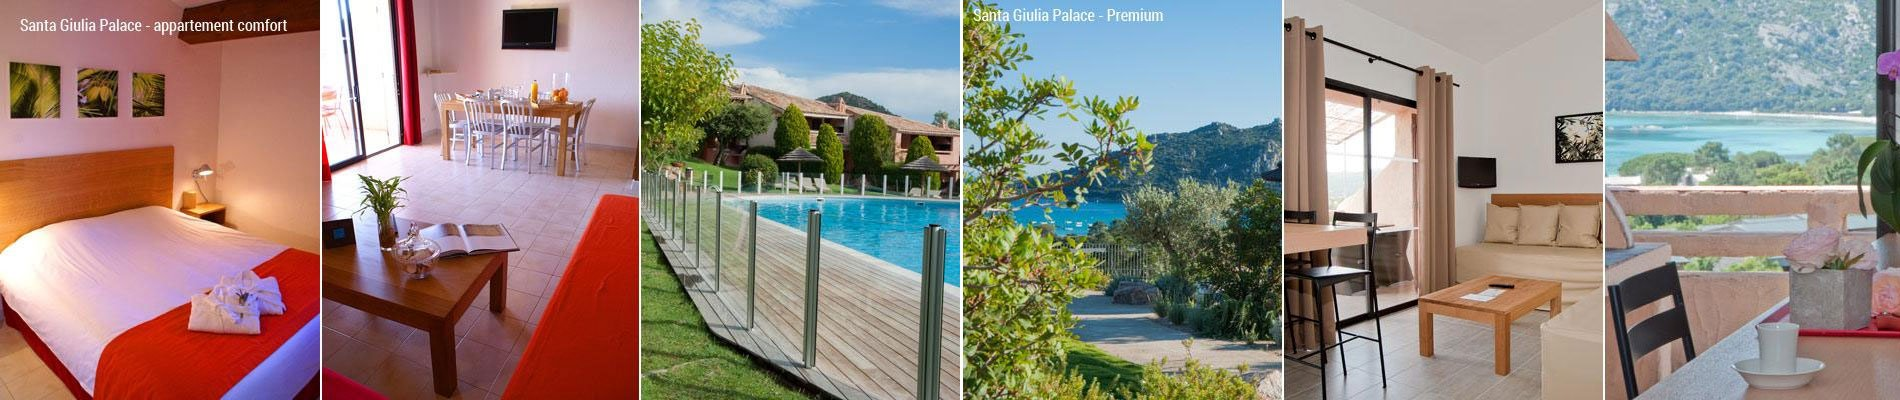 santa-giulia-palace-corsica